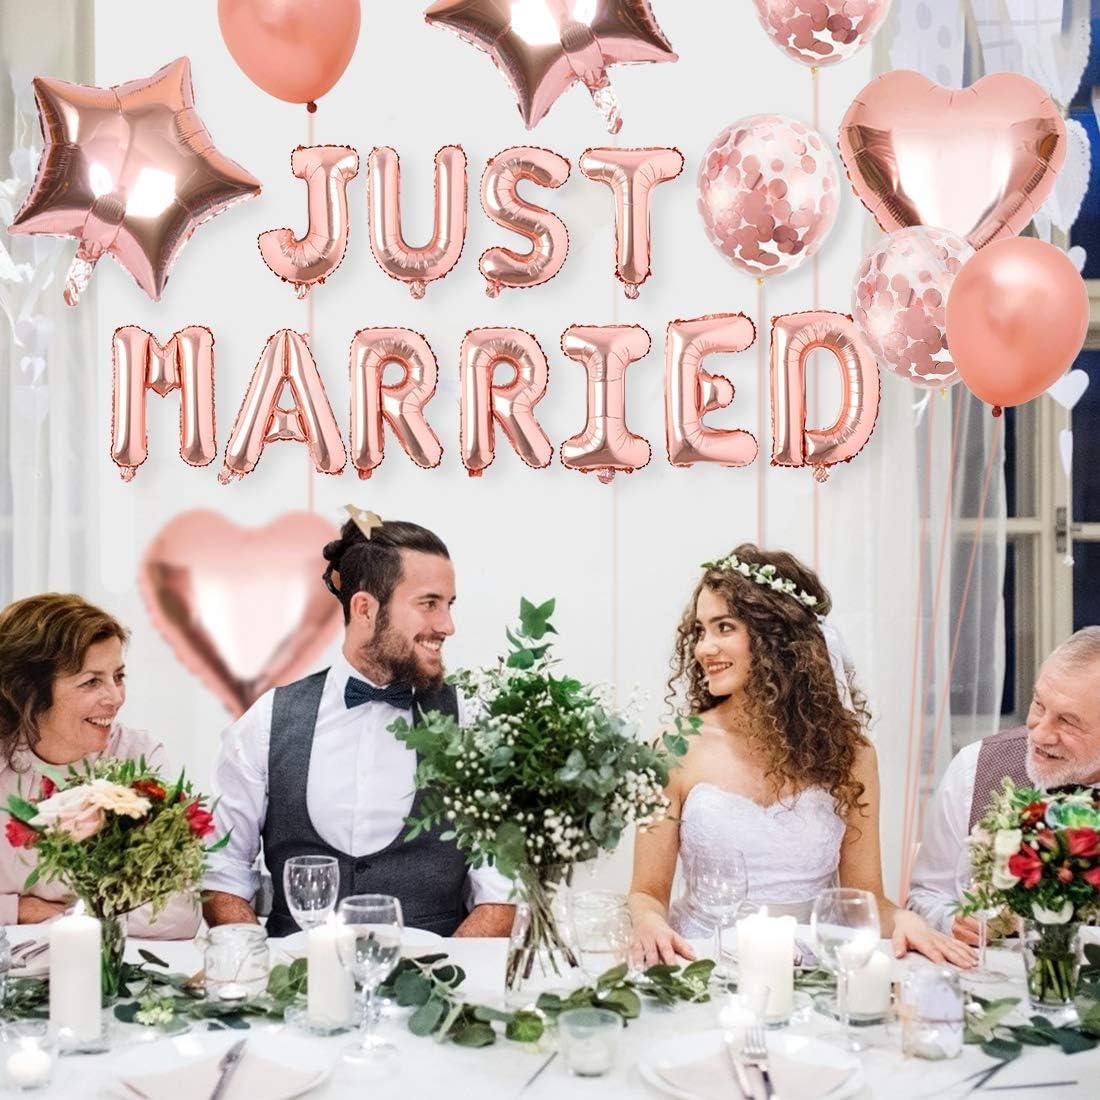 Just Married Ballon f/ür Heiratsantrag Standesamt Verlobung Hochzeitsgeschen Bluelves Just Married Girlande Luftballon Set Hochzeits Ballons Deko Hochzeitsballon